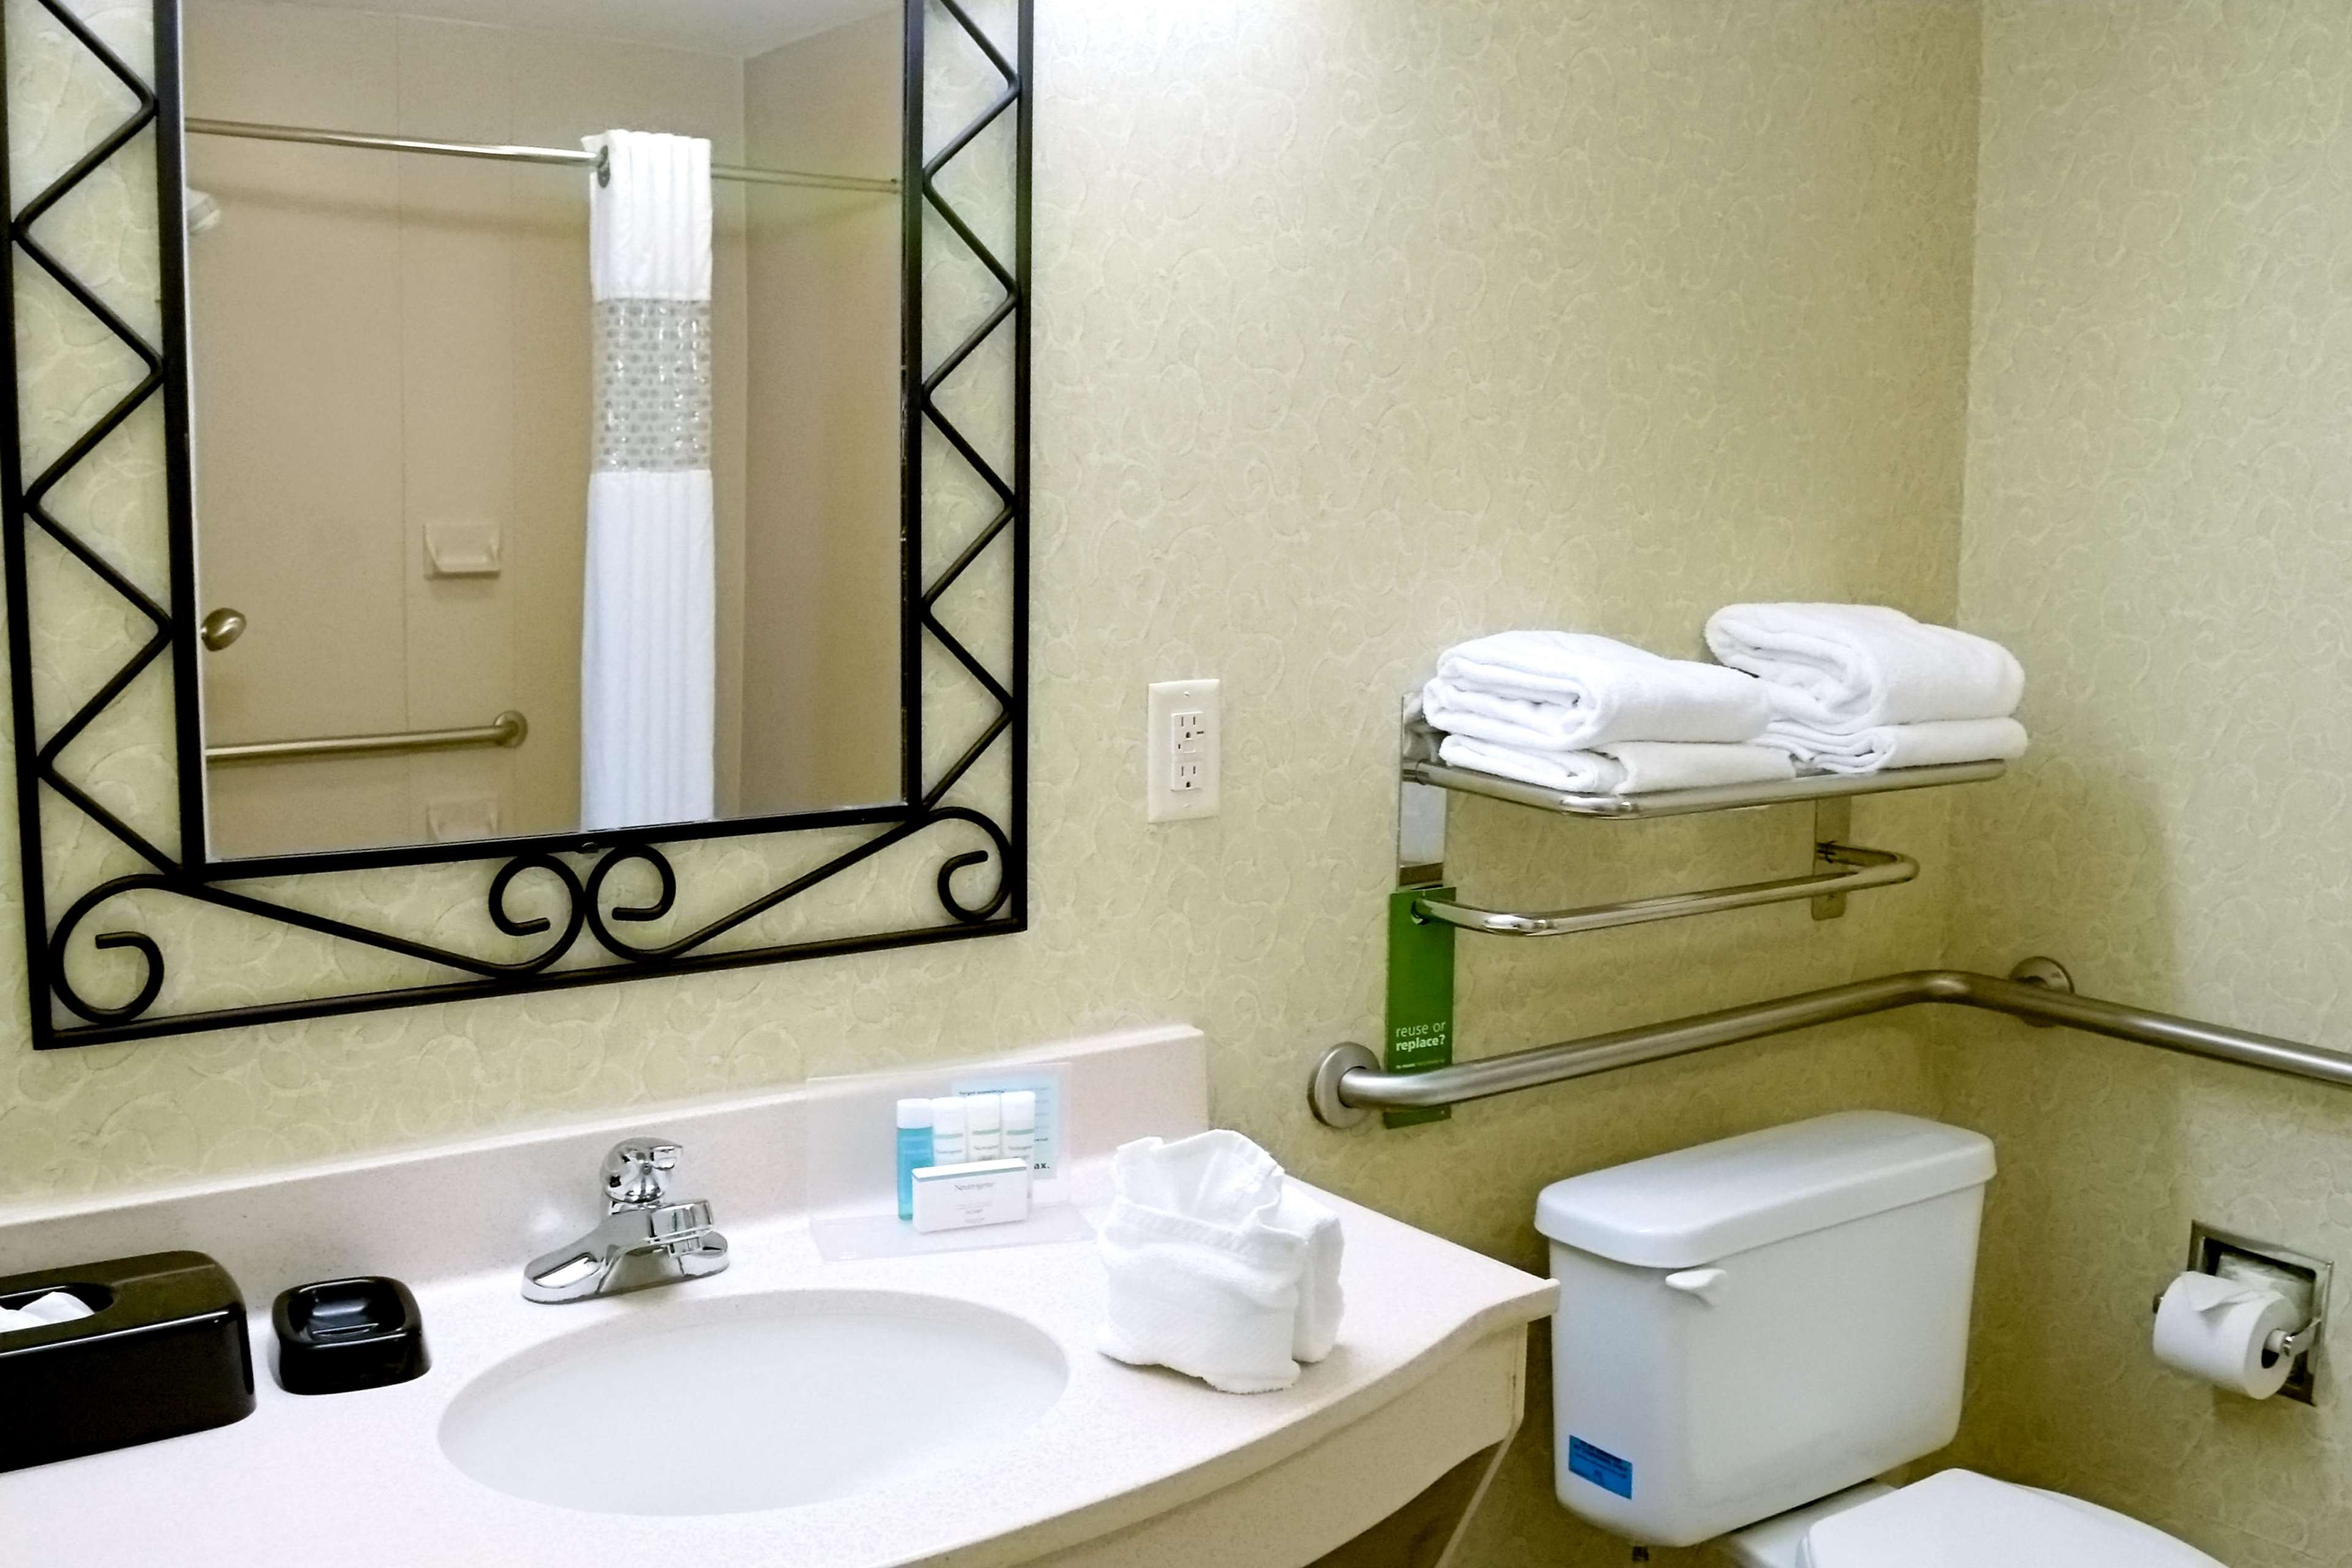 Accessible Bathroom wRoll In Shower